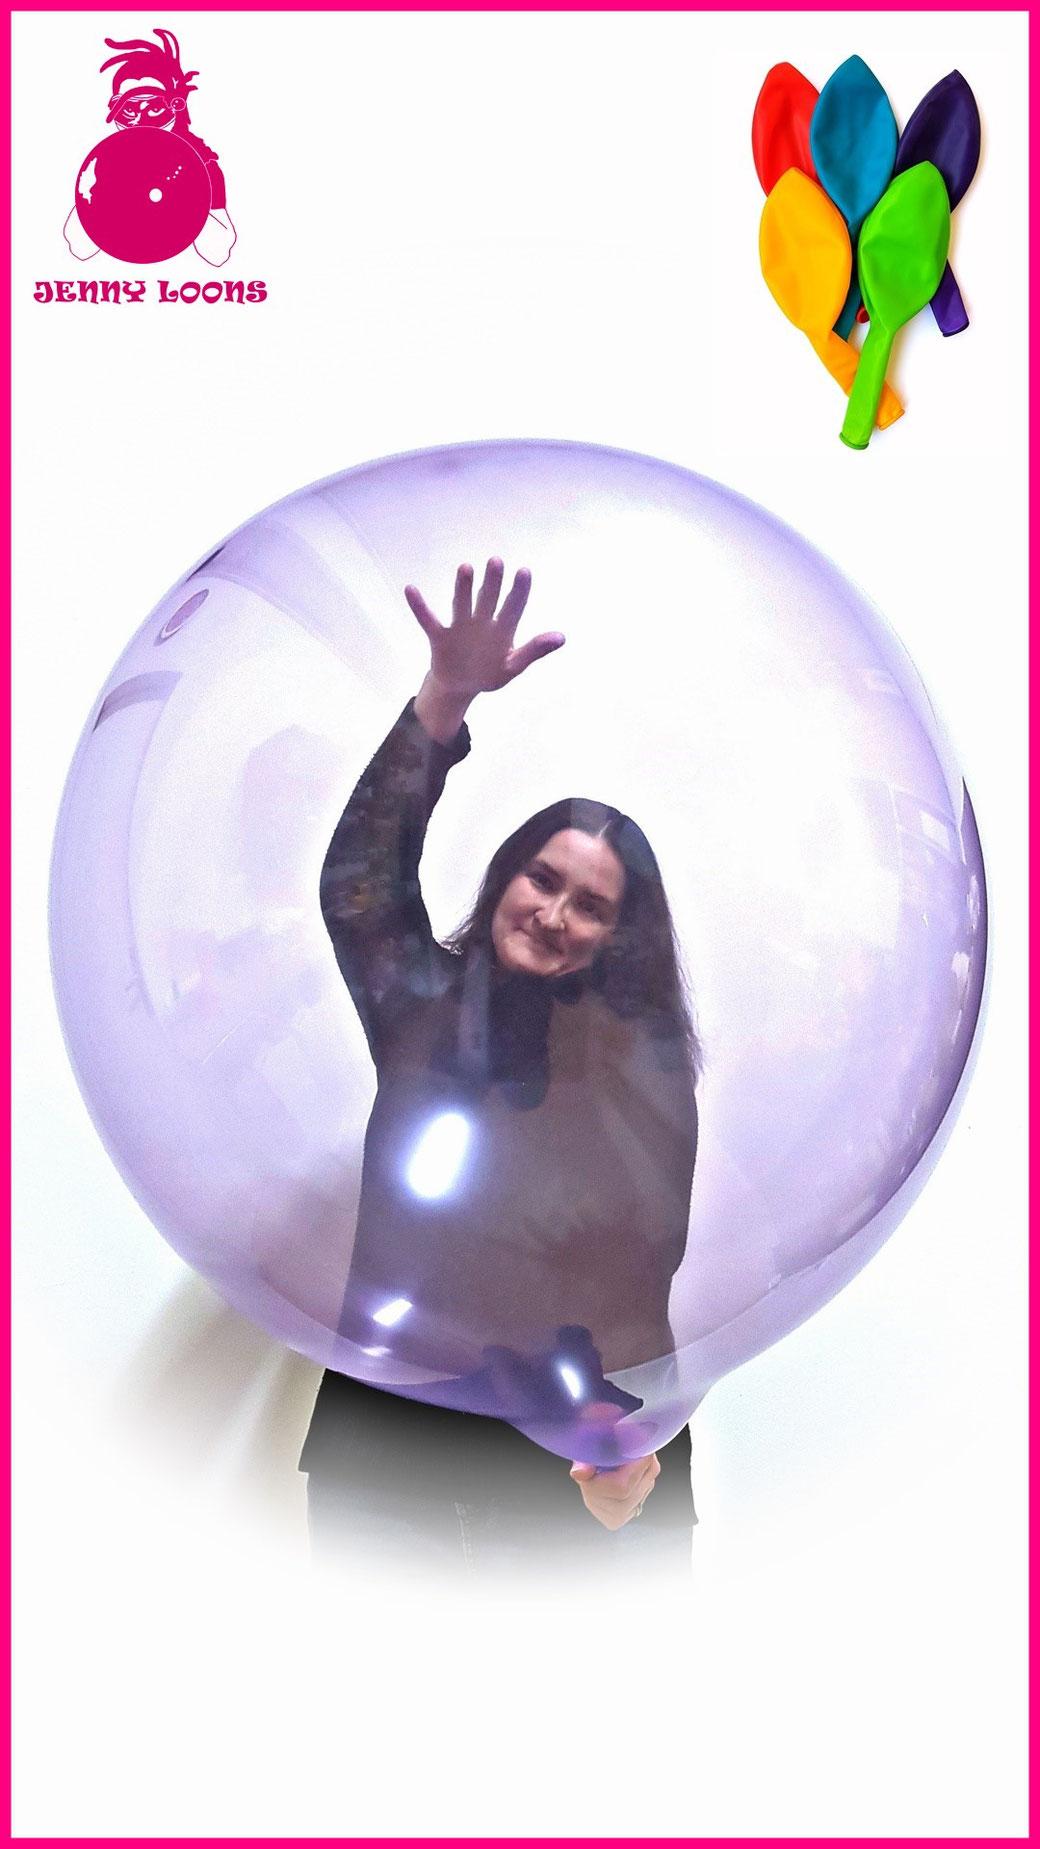 JENNY LOONS Luftballons Soft Crystal Premium Latexballons Eigenmarke 100% Latex heliumgeeignet latexballoons